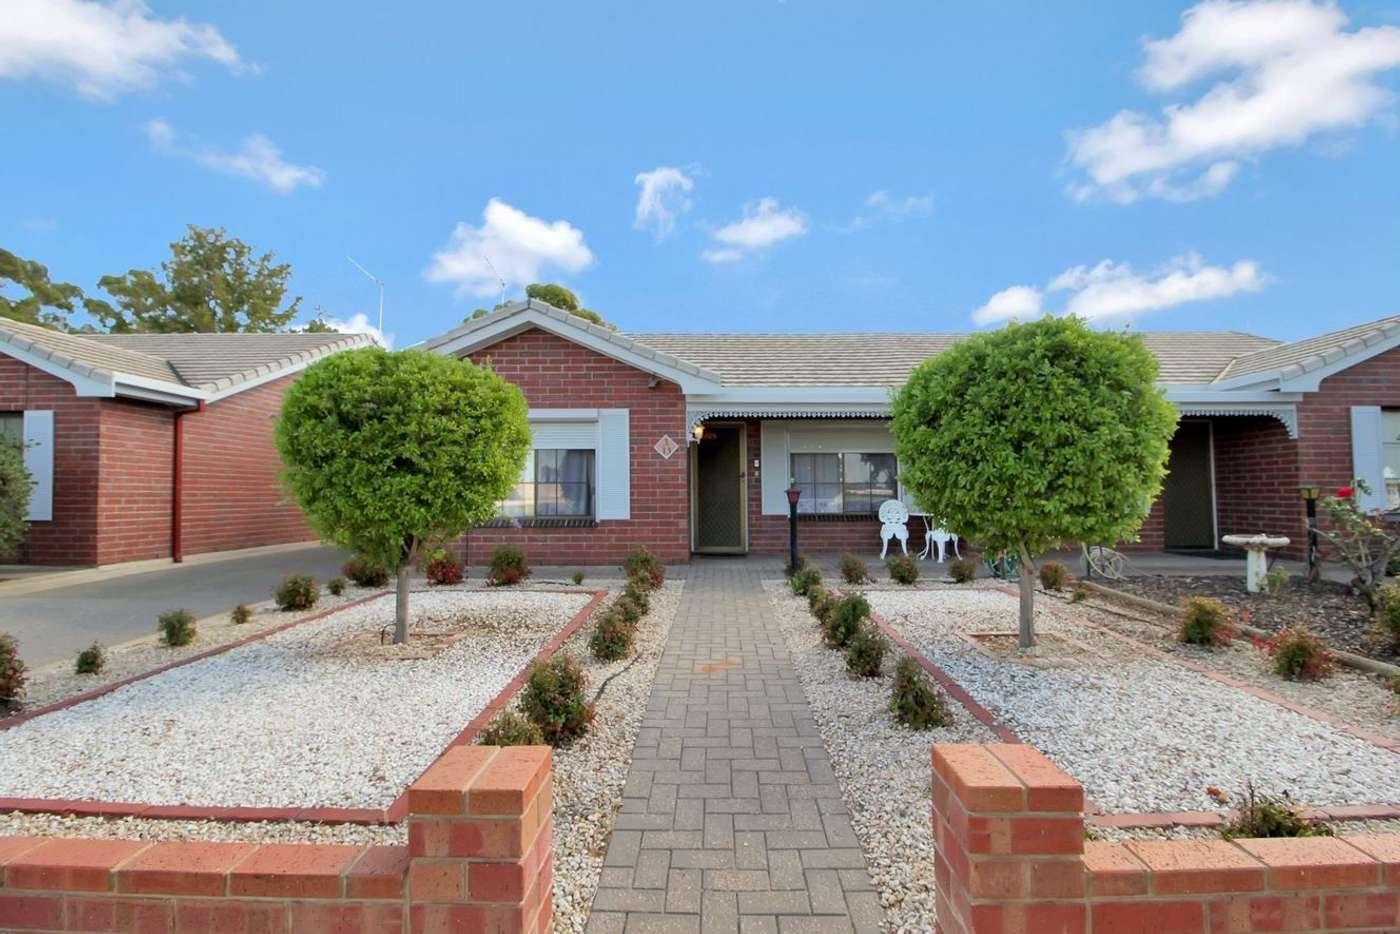 Main view of Homely house listing, 3/13 Scott Avenue, Barmera SA 5345